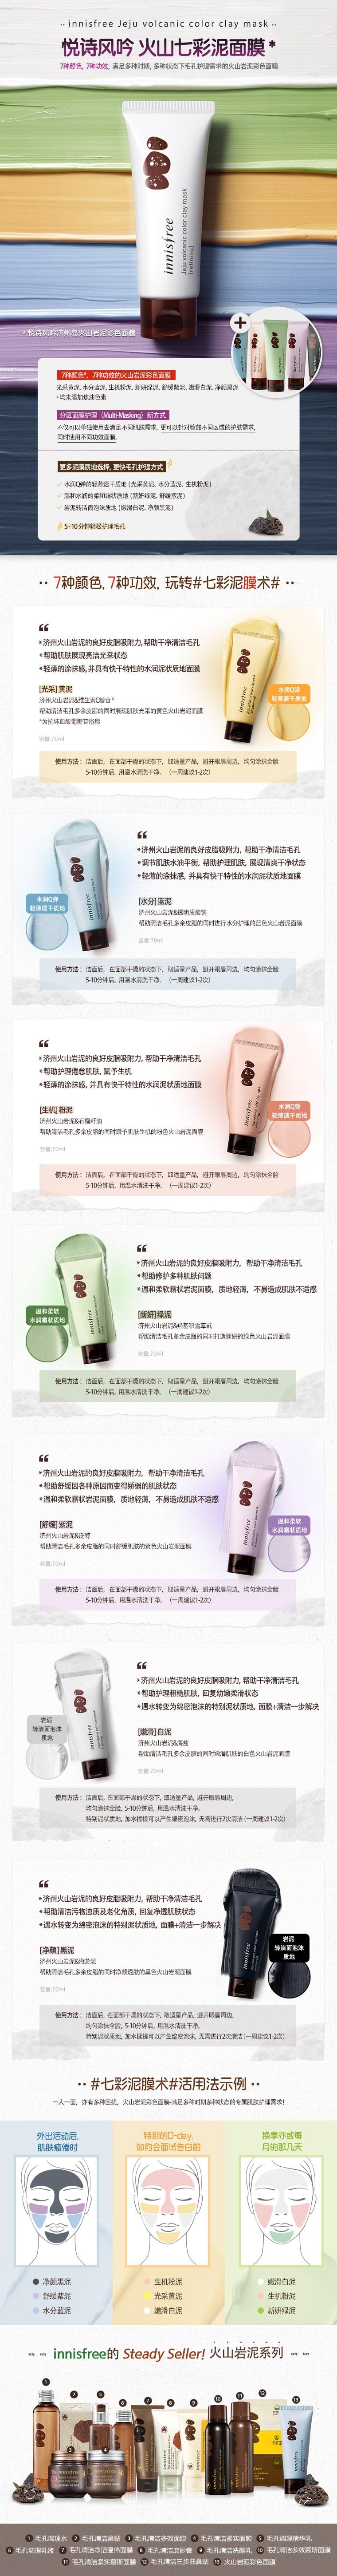 Jeju Volcanic Color Clay Mask - Info